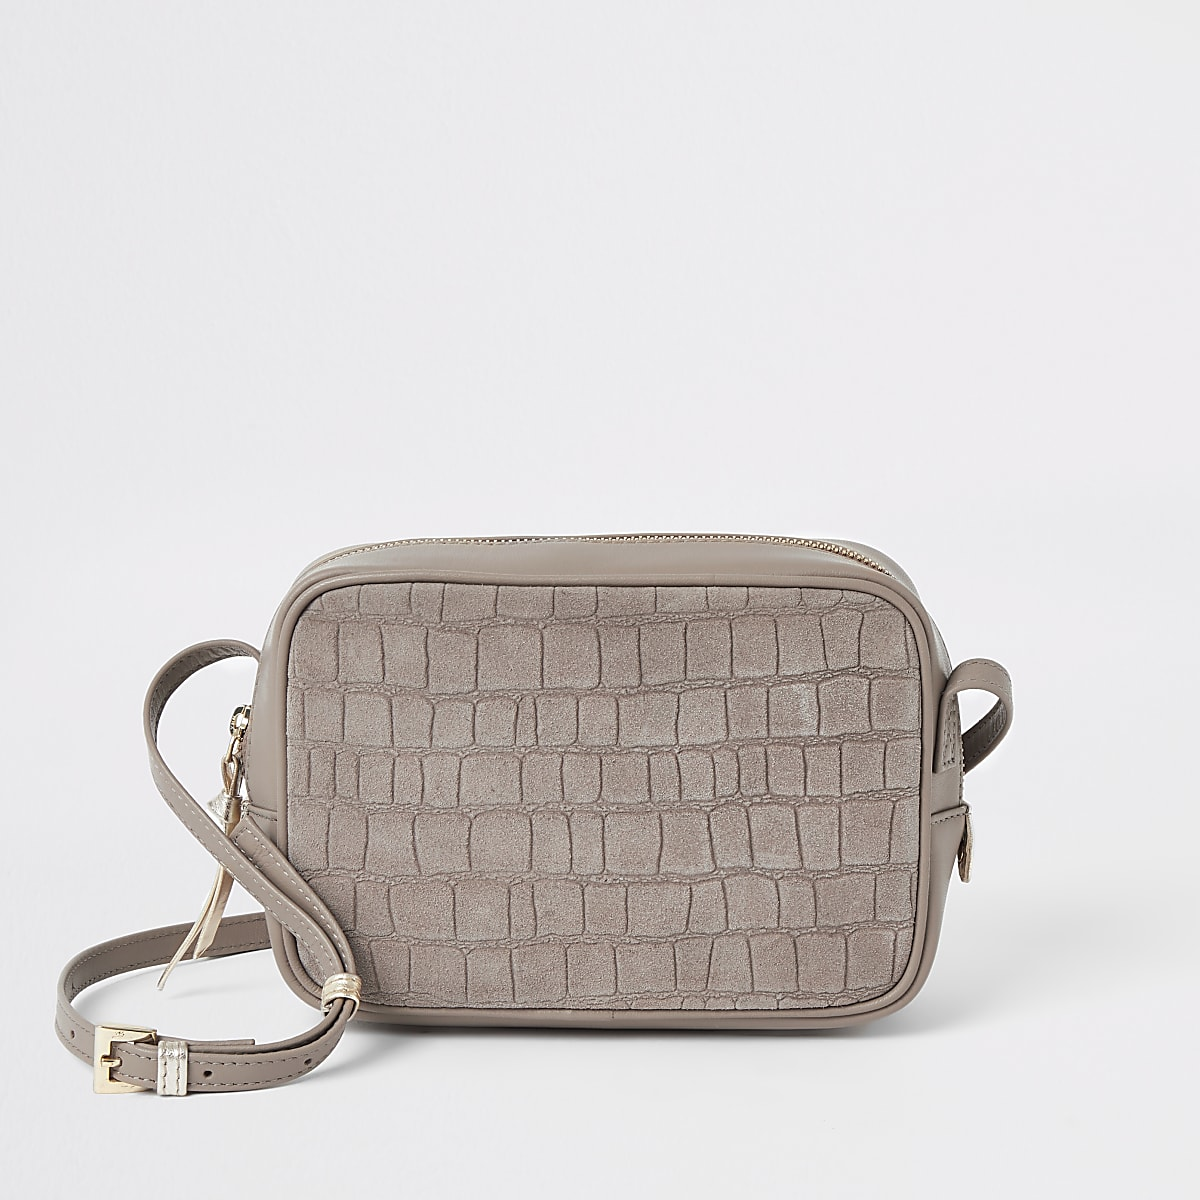 Beige leather croc mini boxy cross body bag